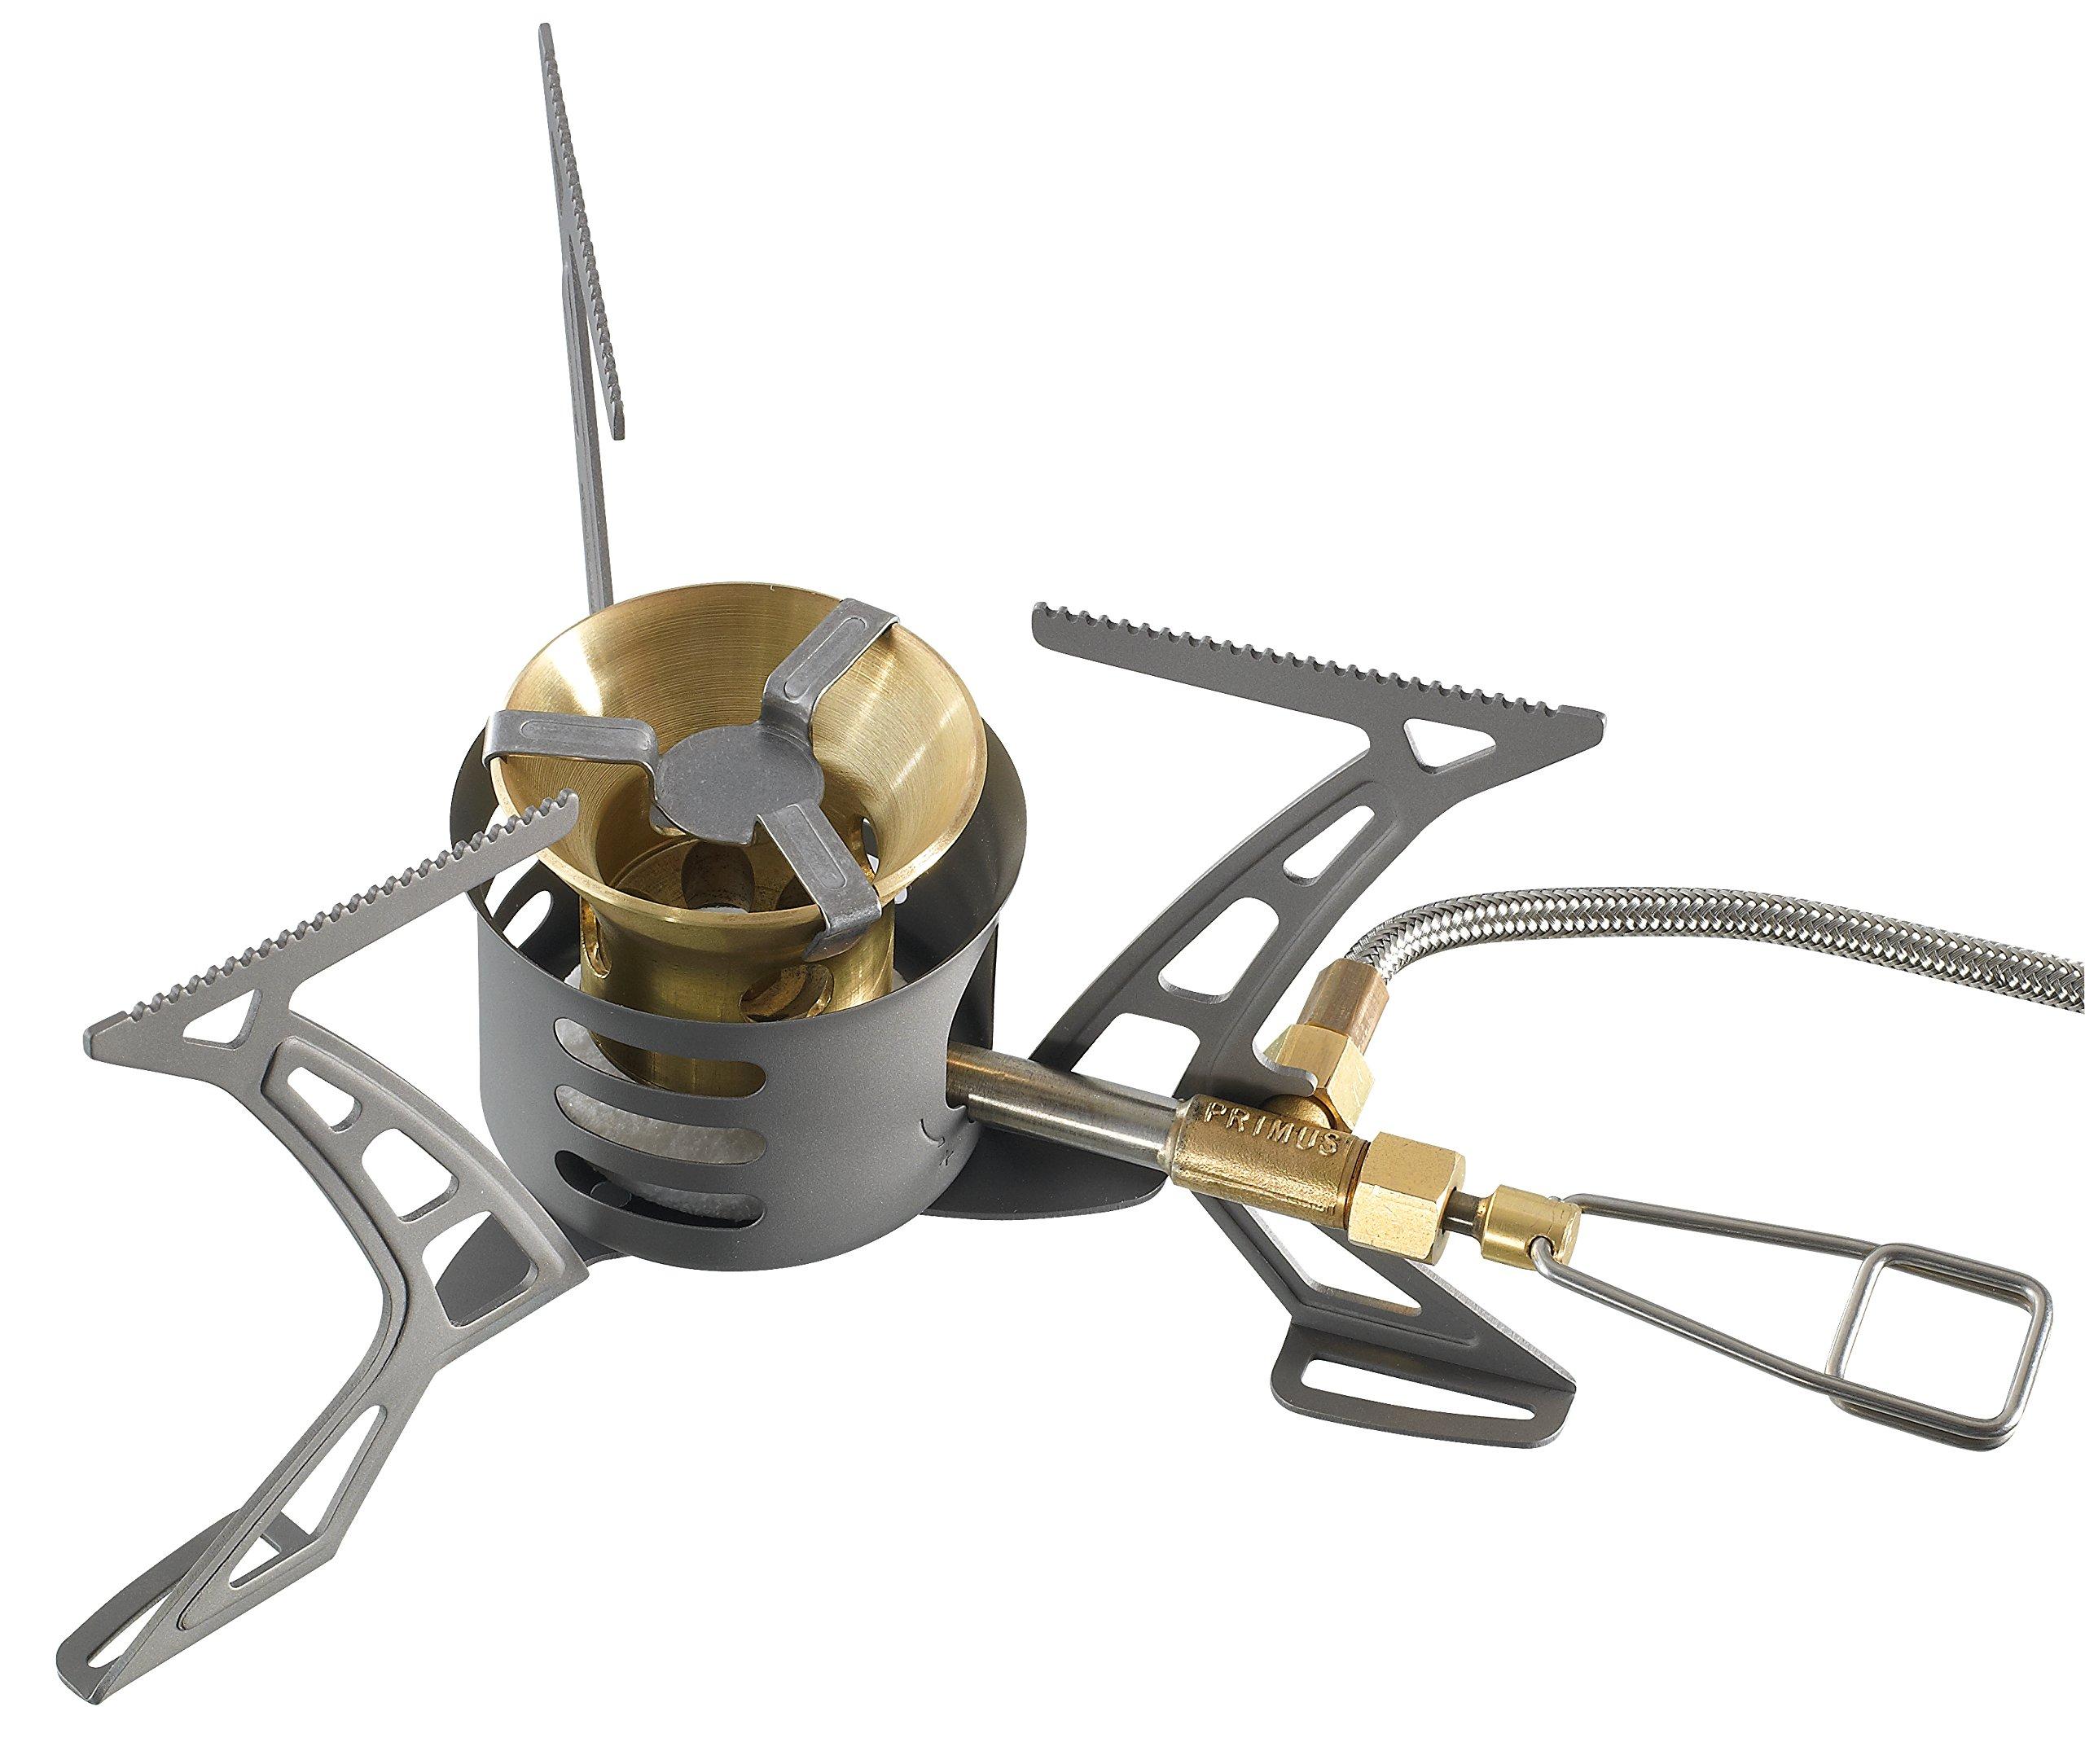 Primus OmniLite TI camping stove grey camping stove by Primus (Image #6)